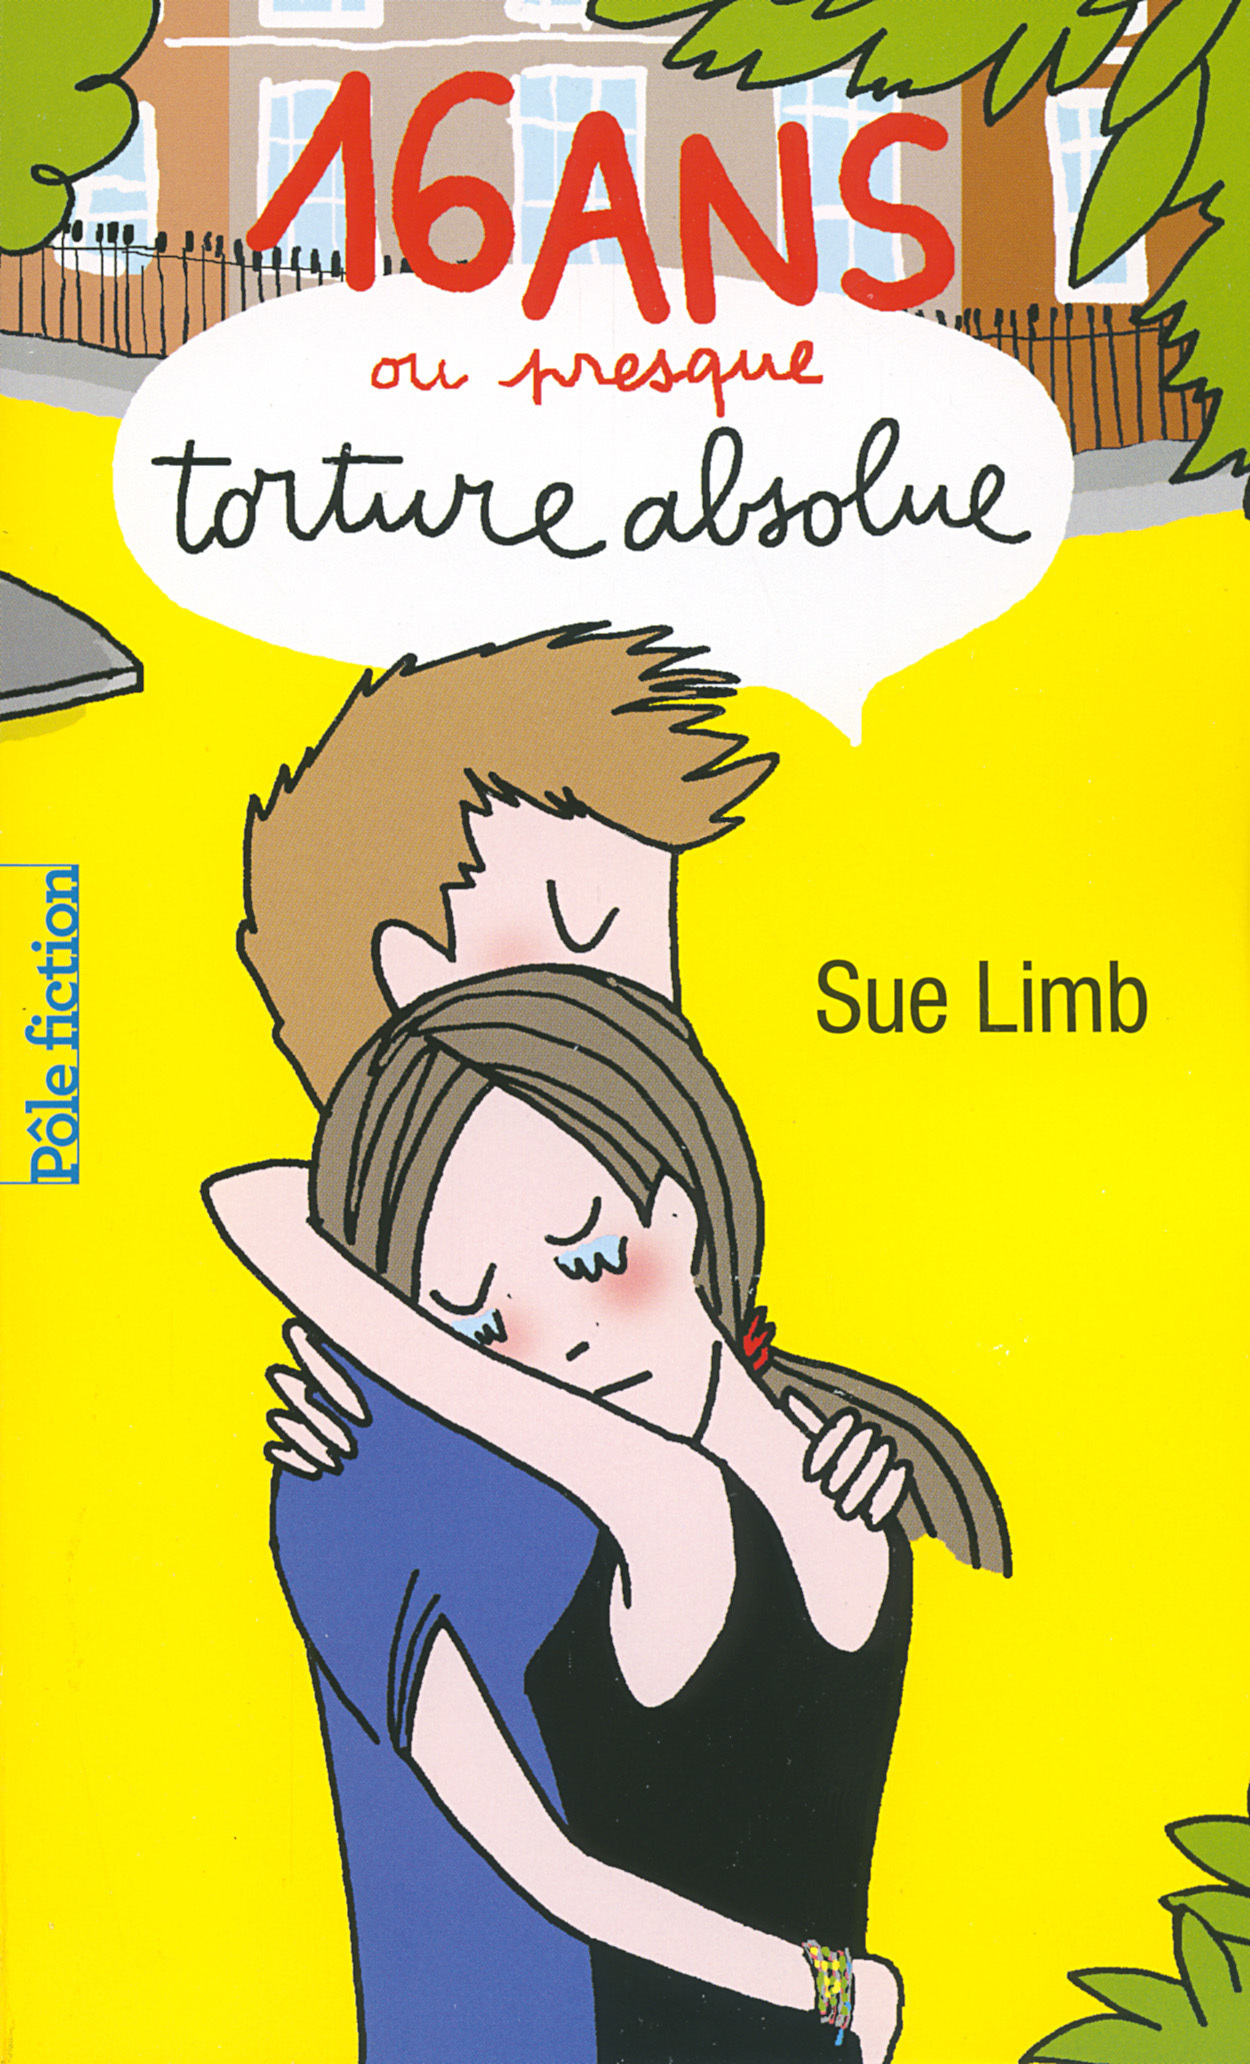 16 ans ou presque, torture absolue   Limb, Sue